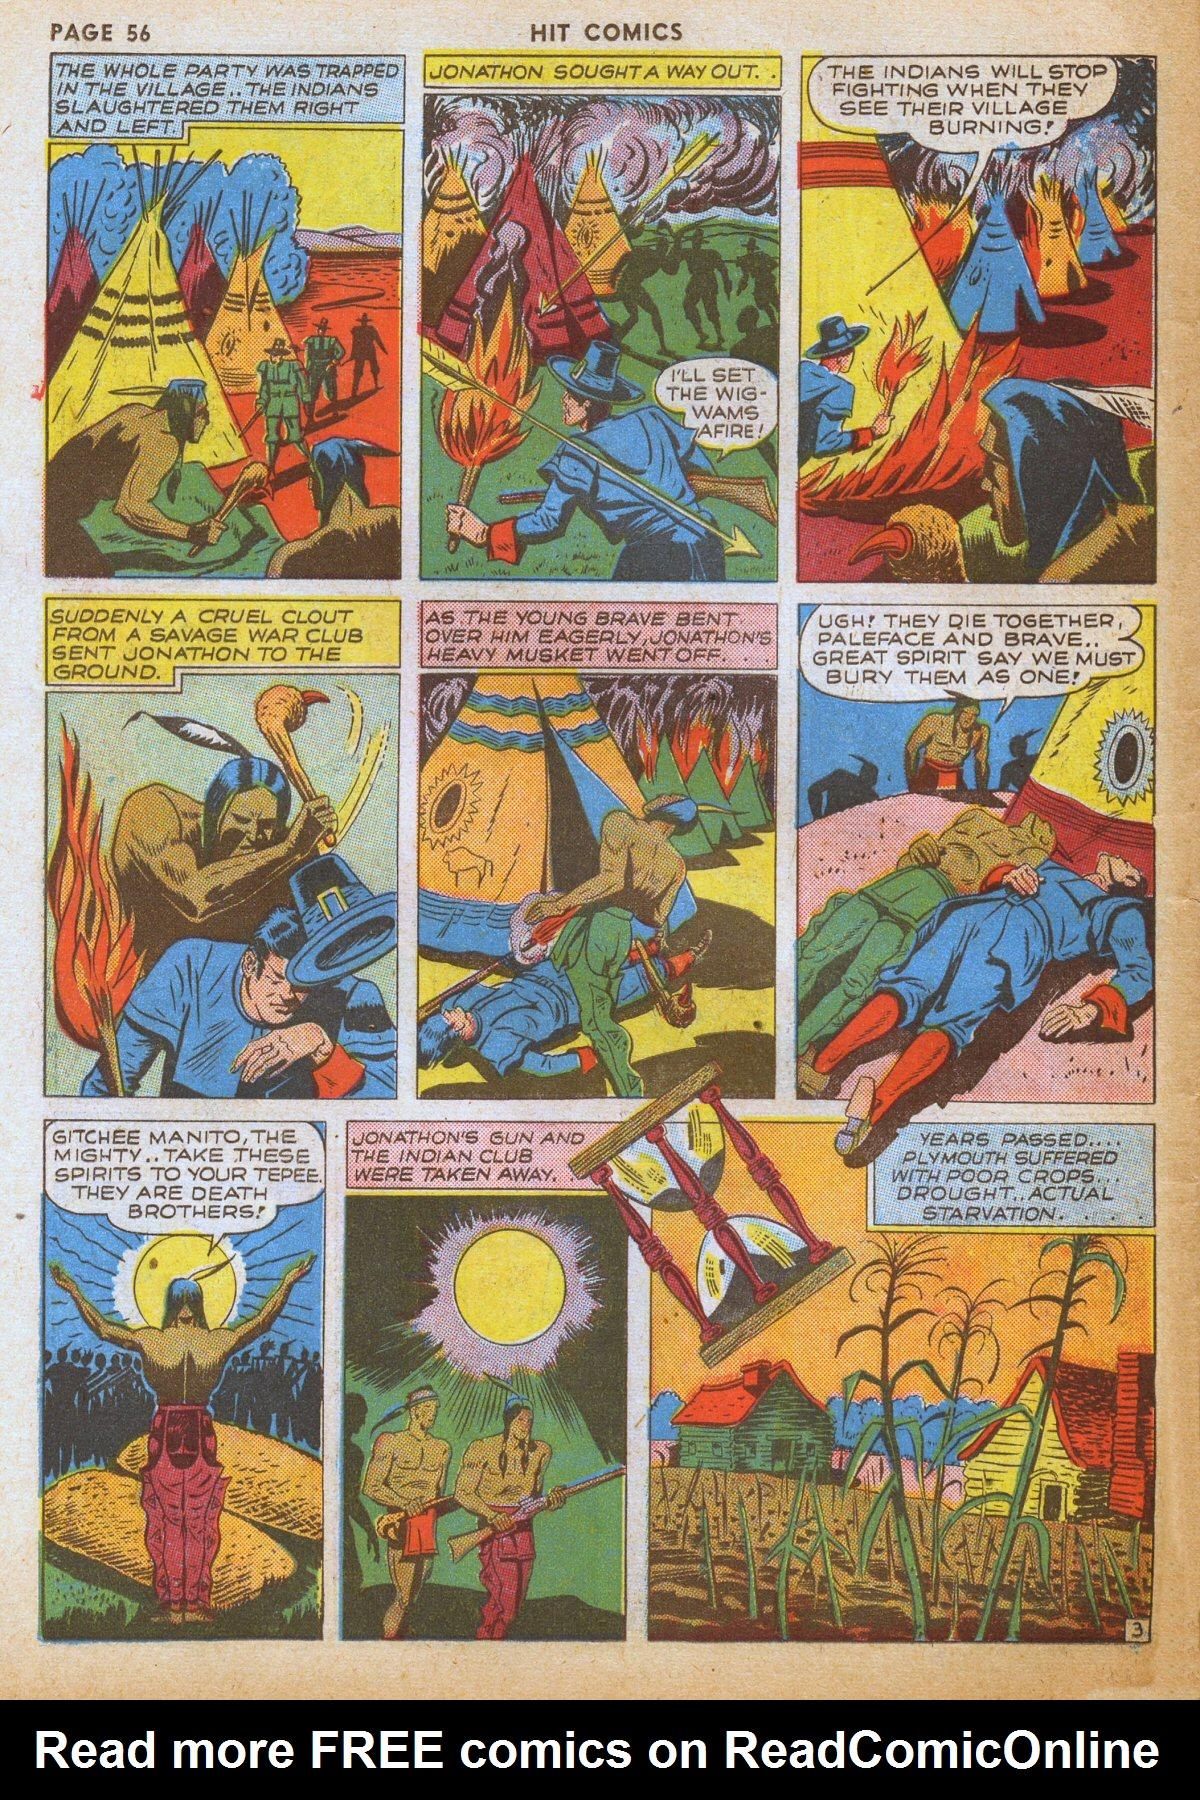 Read online Hit Comics comic -  Issue #12 - 58